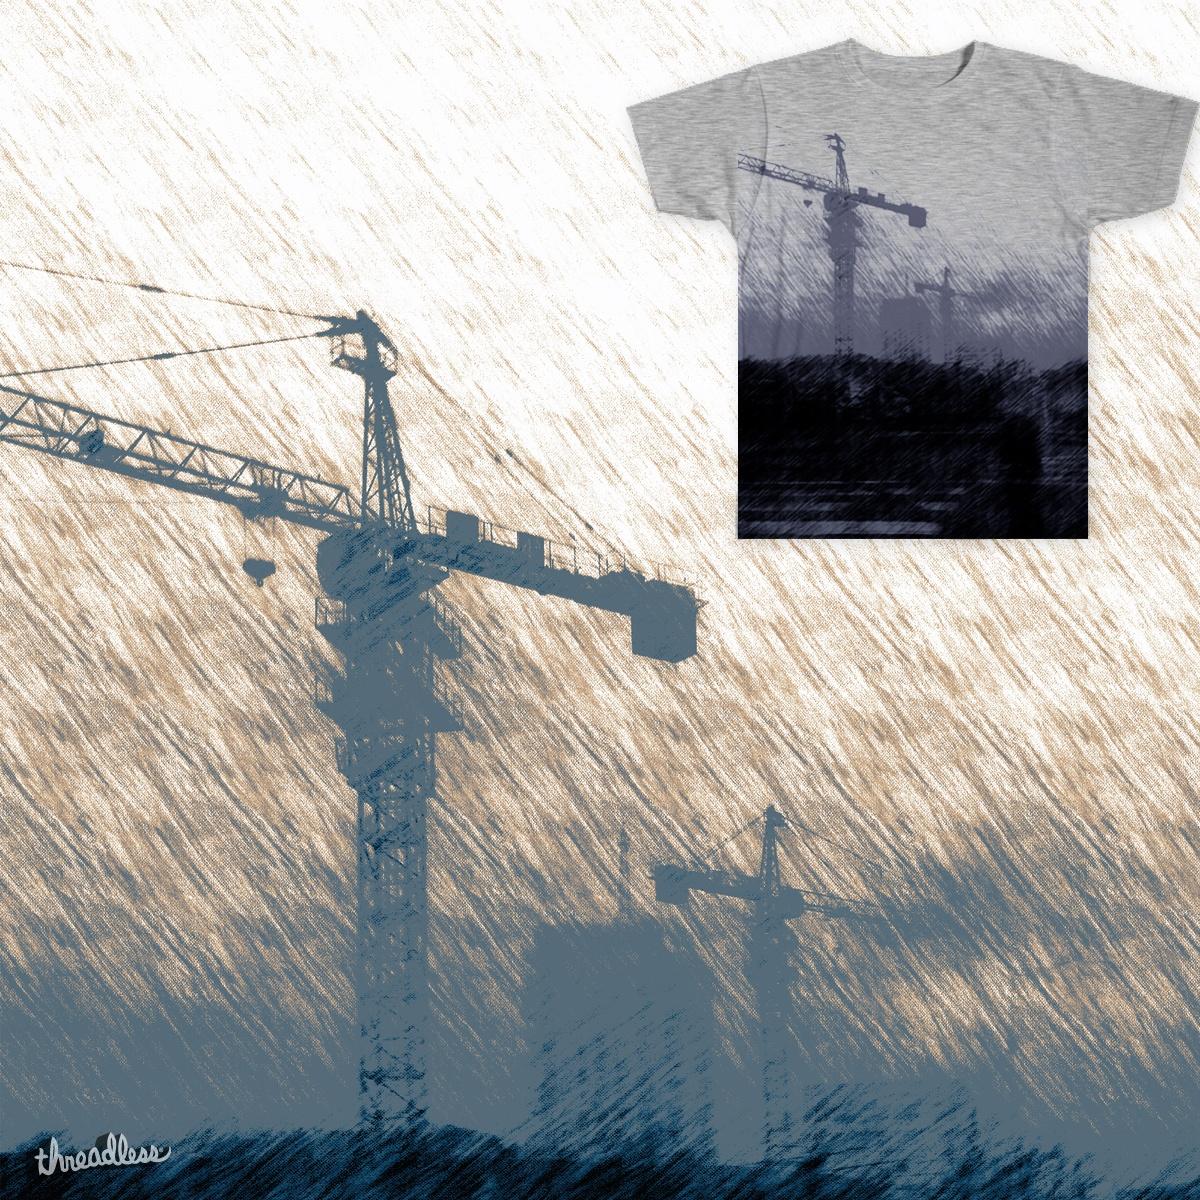 Rainy Day by AroLije on Threadless